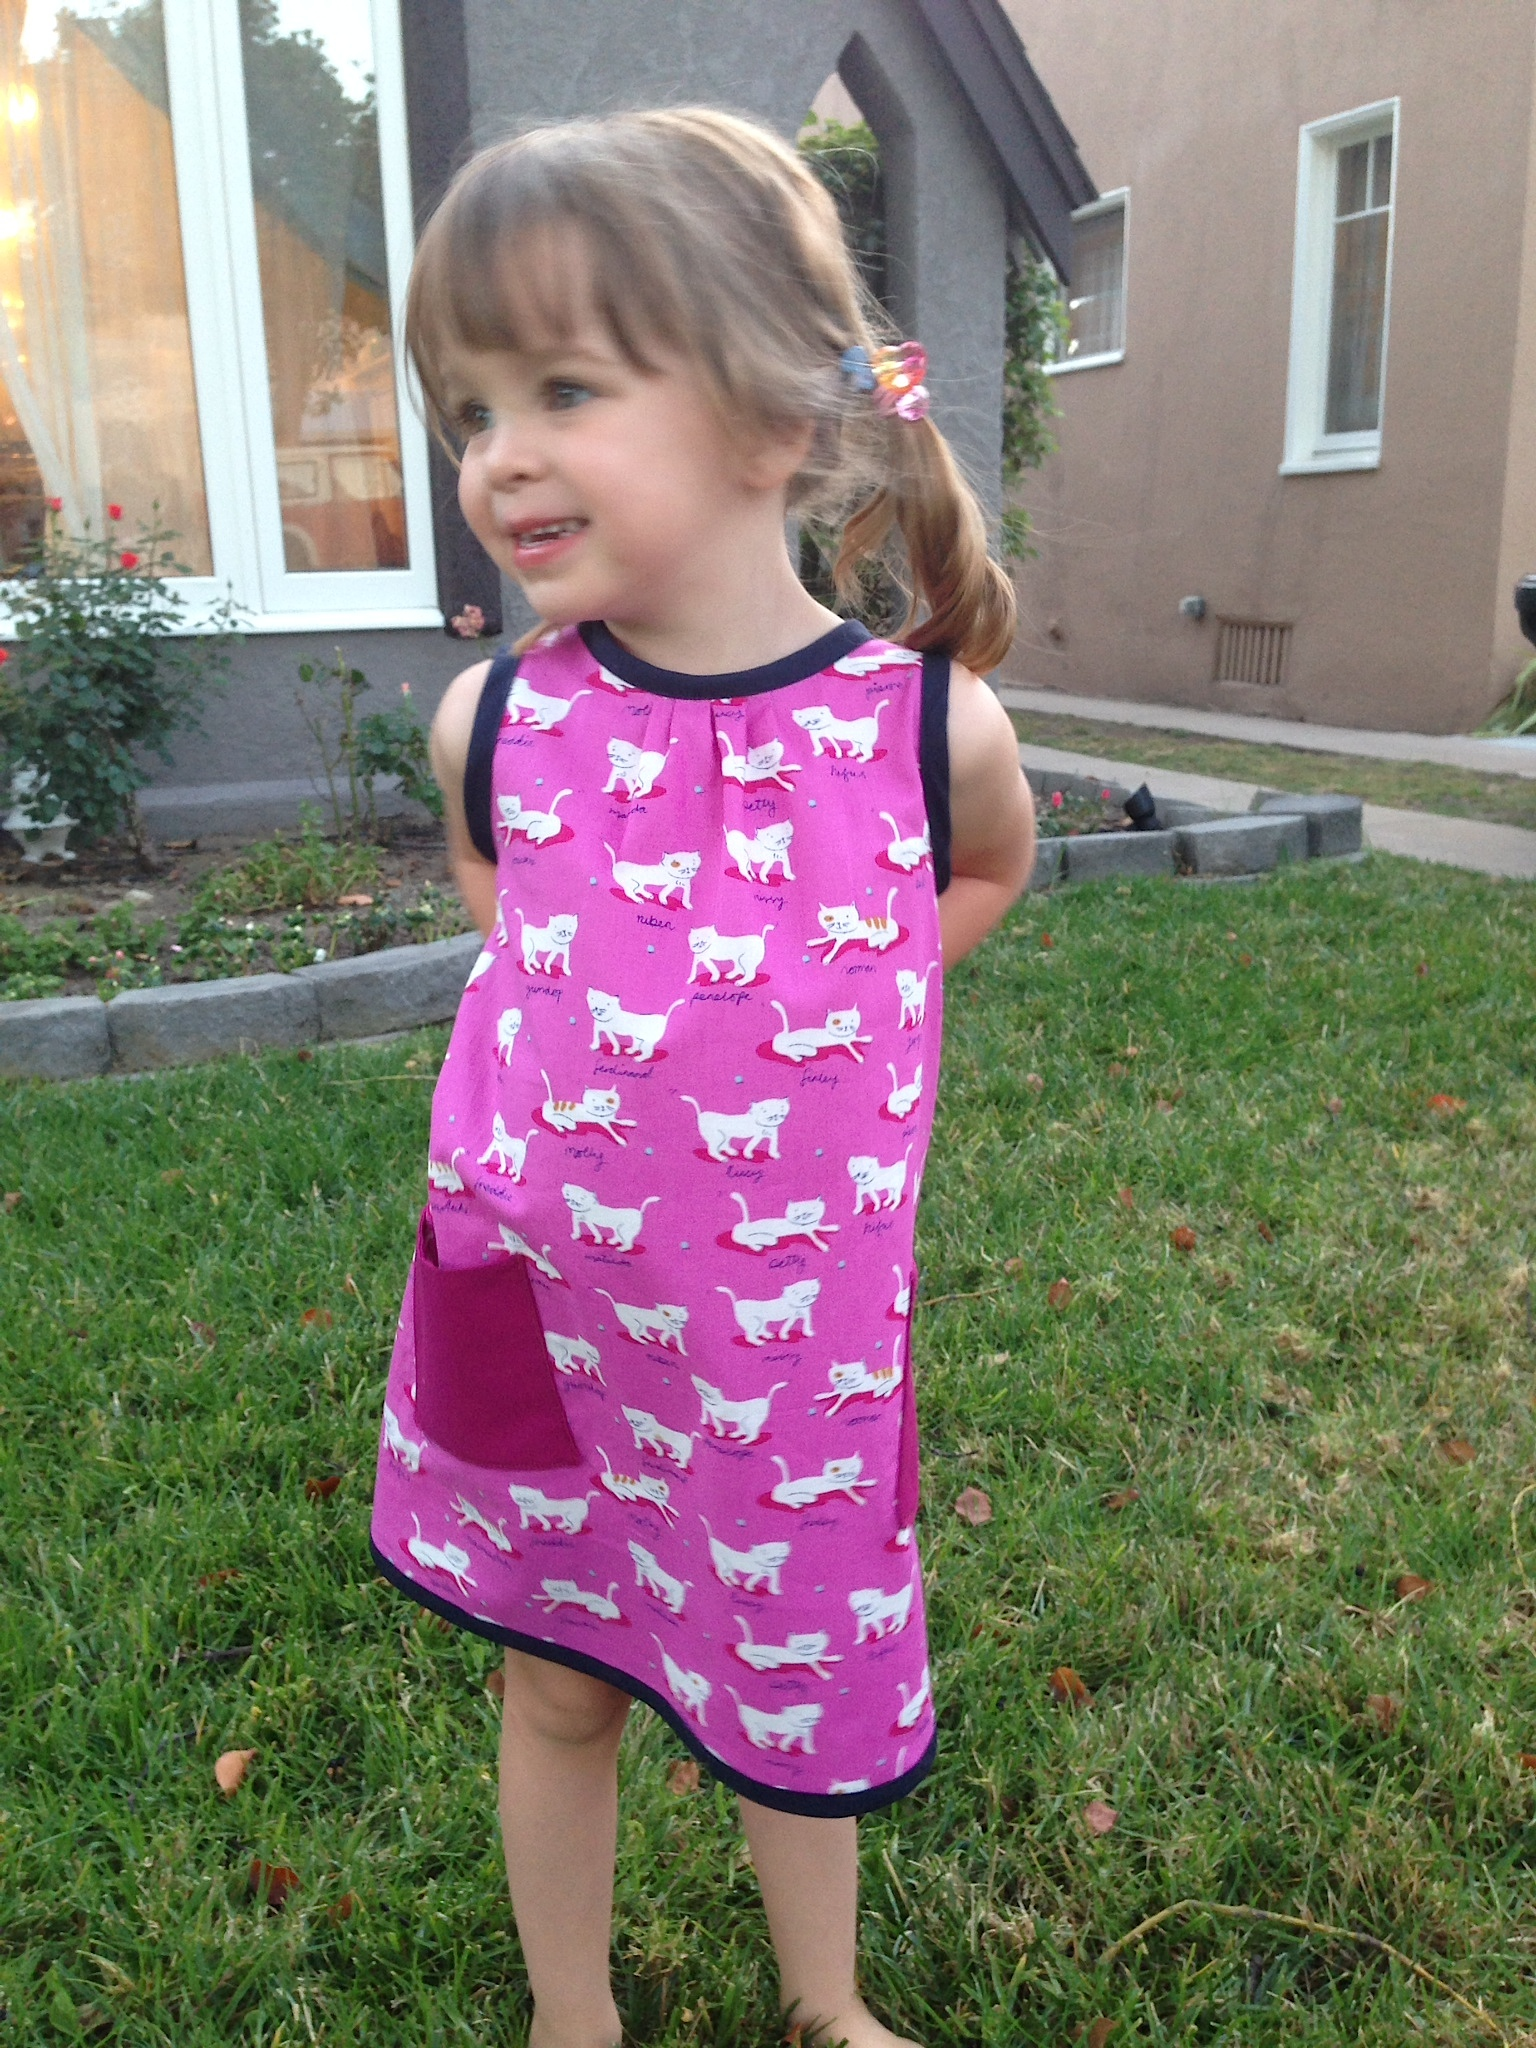 Harga Dan Spek Dress Ramona Pink Termurah 2018 Kue Putri Ayu By Be Cookied Akumandiri The Speedy Zip A Giveaway Is So Awesome And Has Offered To Give